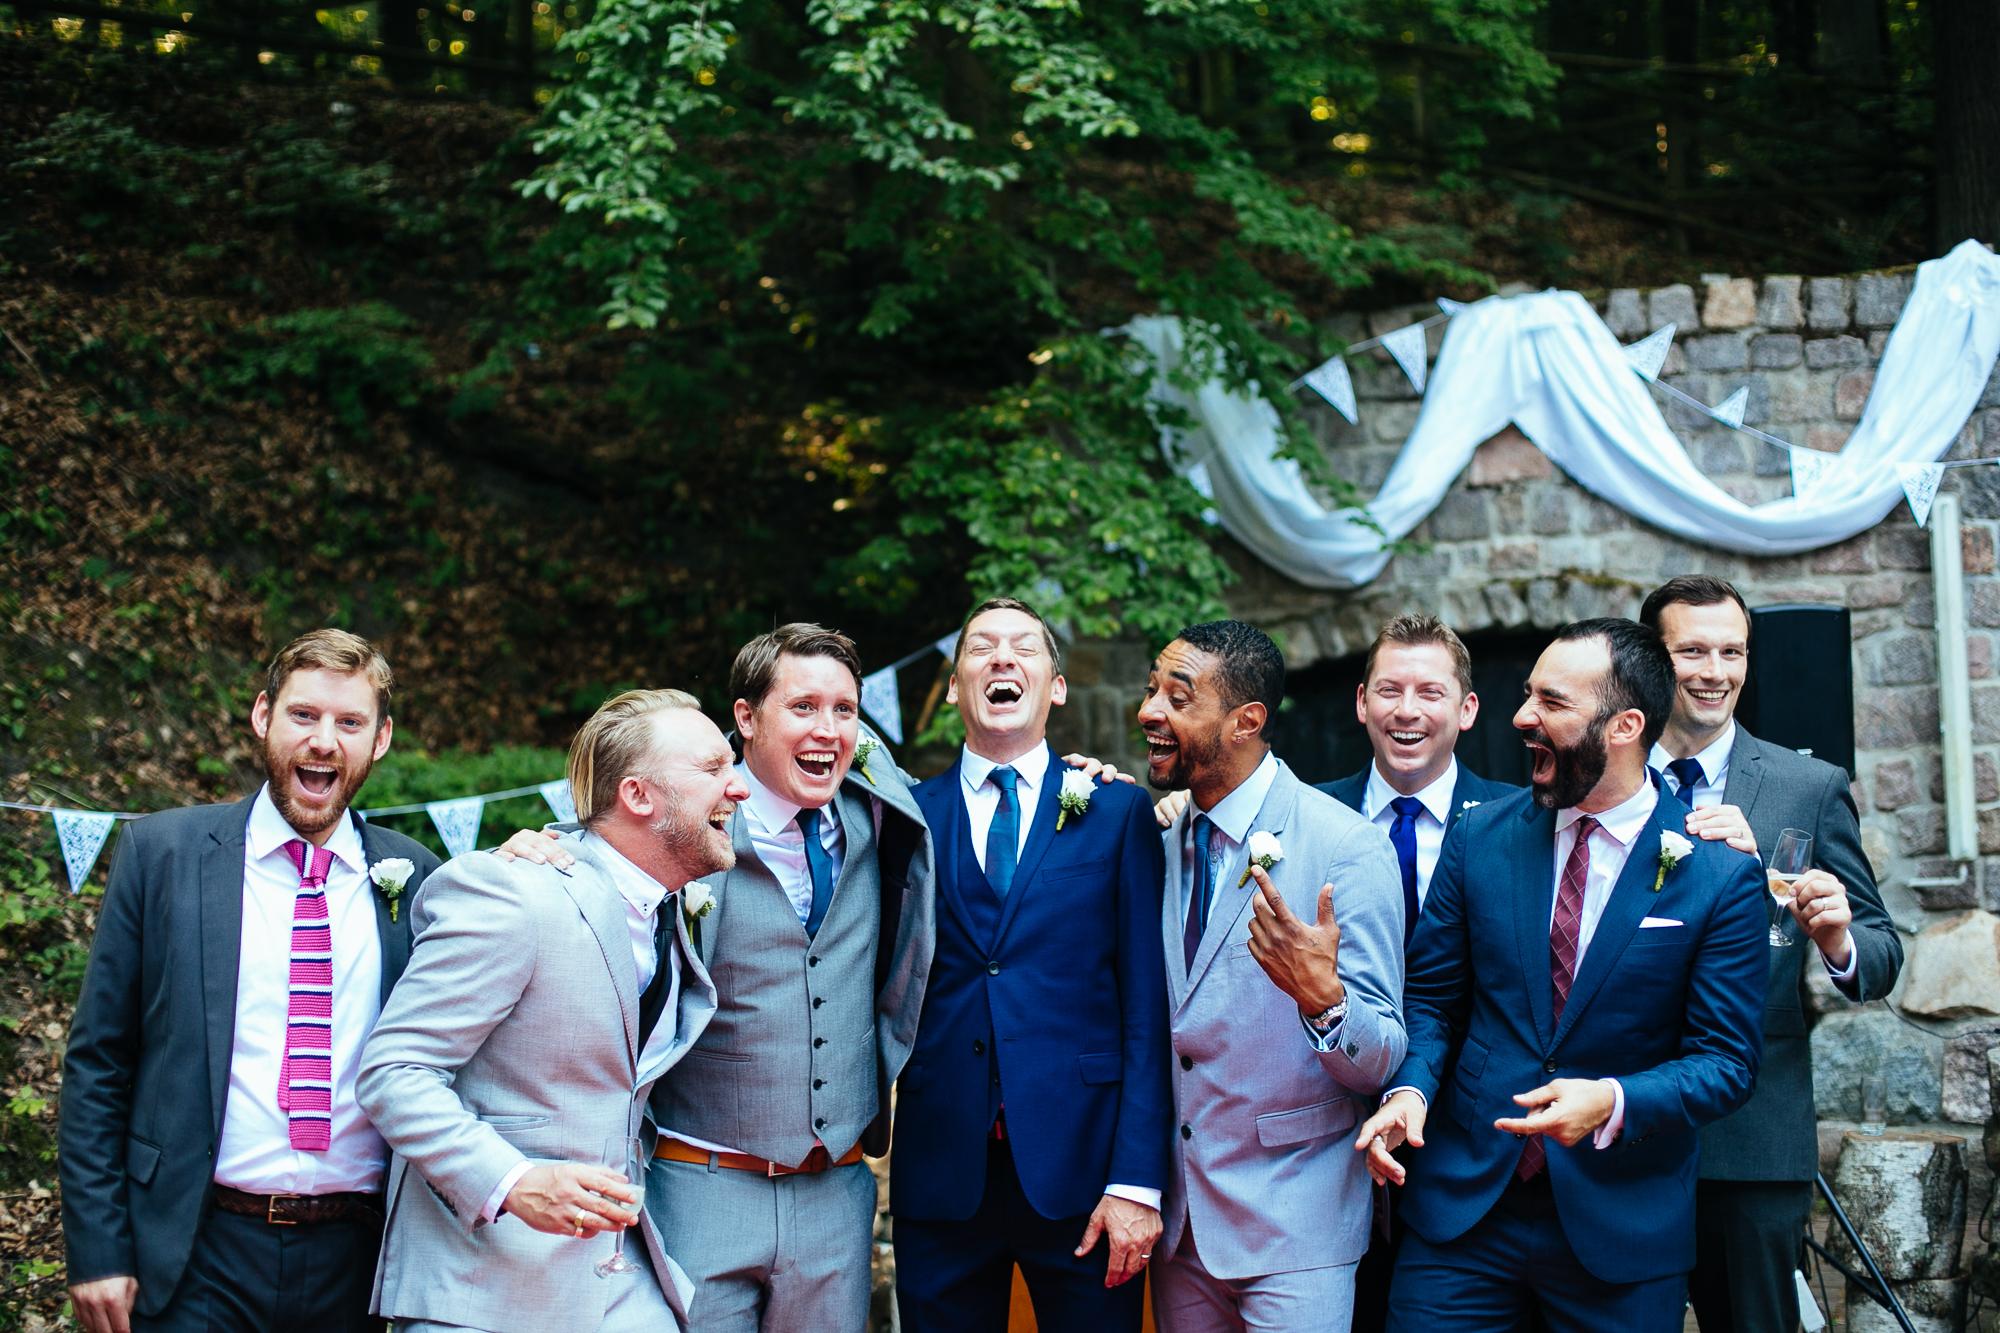 groom groomsmen ushers laughing group photograph destination wedding photography